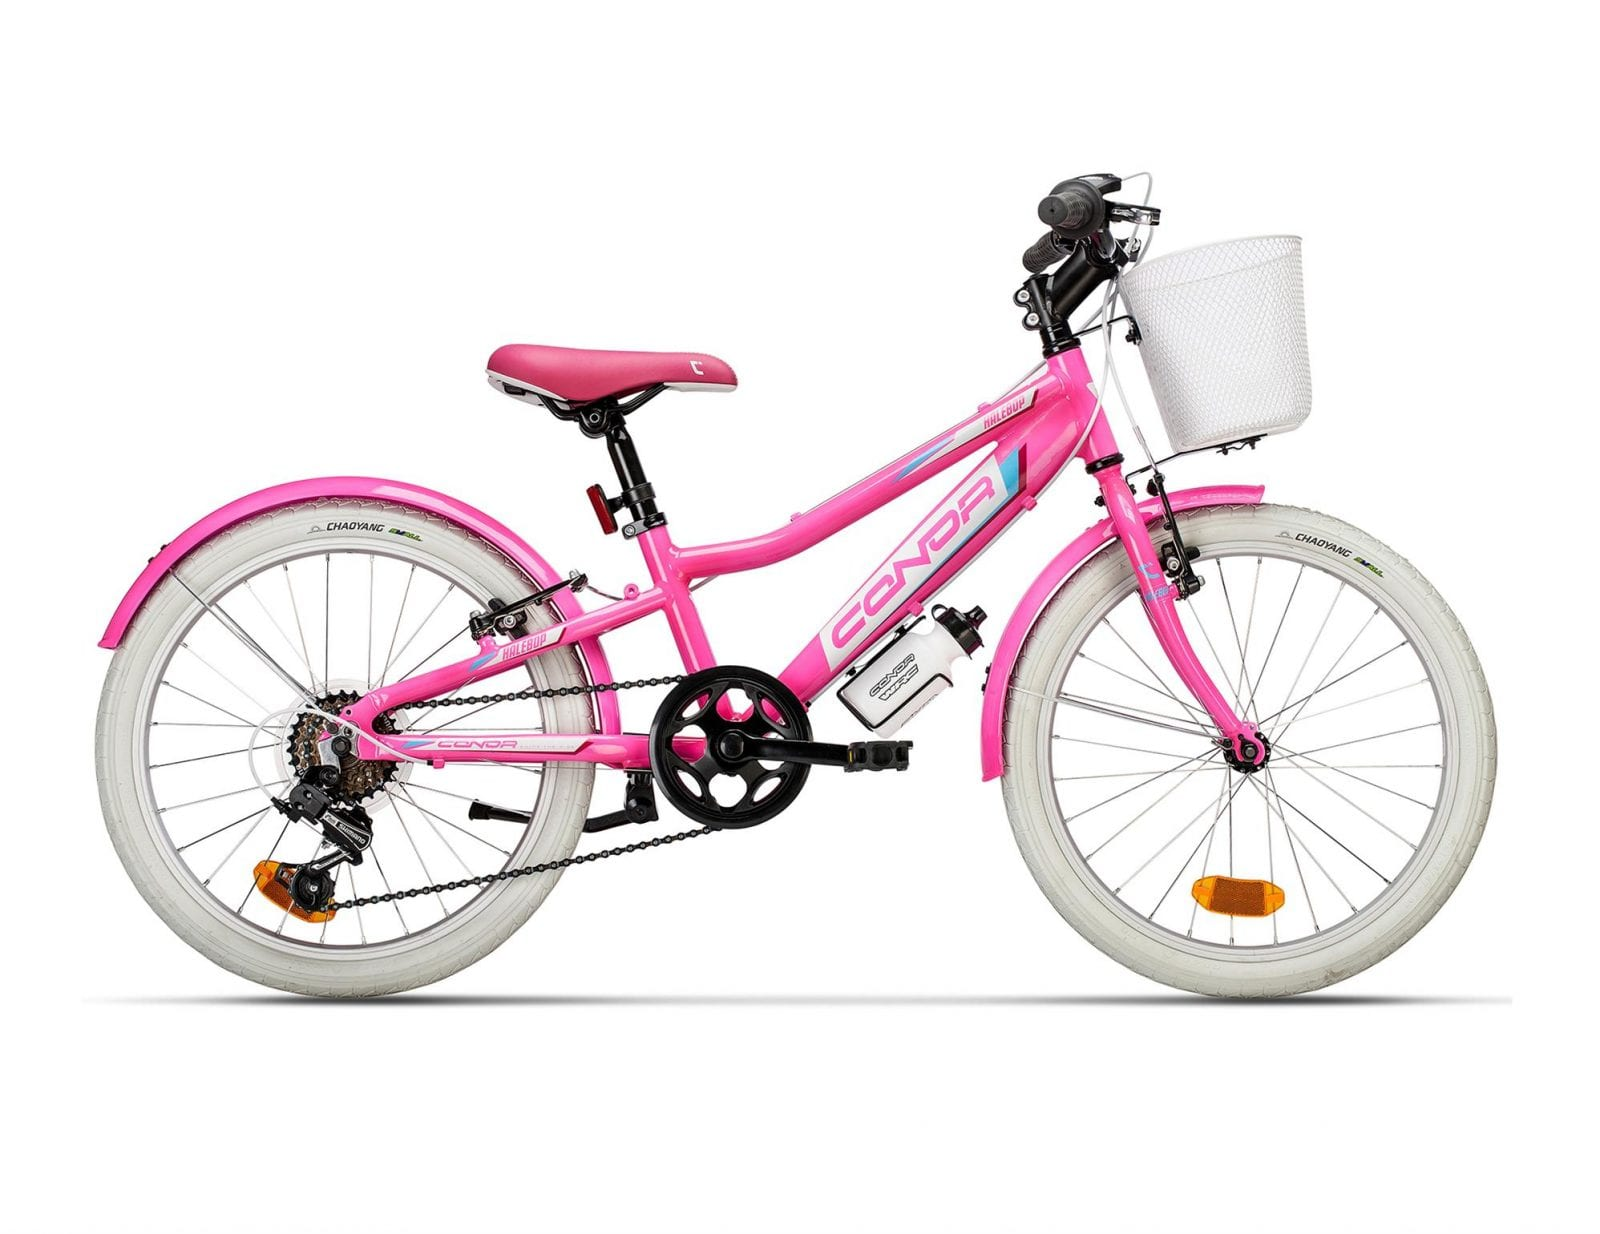 Conor-Halebop-20-Rosa-Vuk-Bikes-Madrid